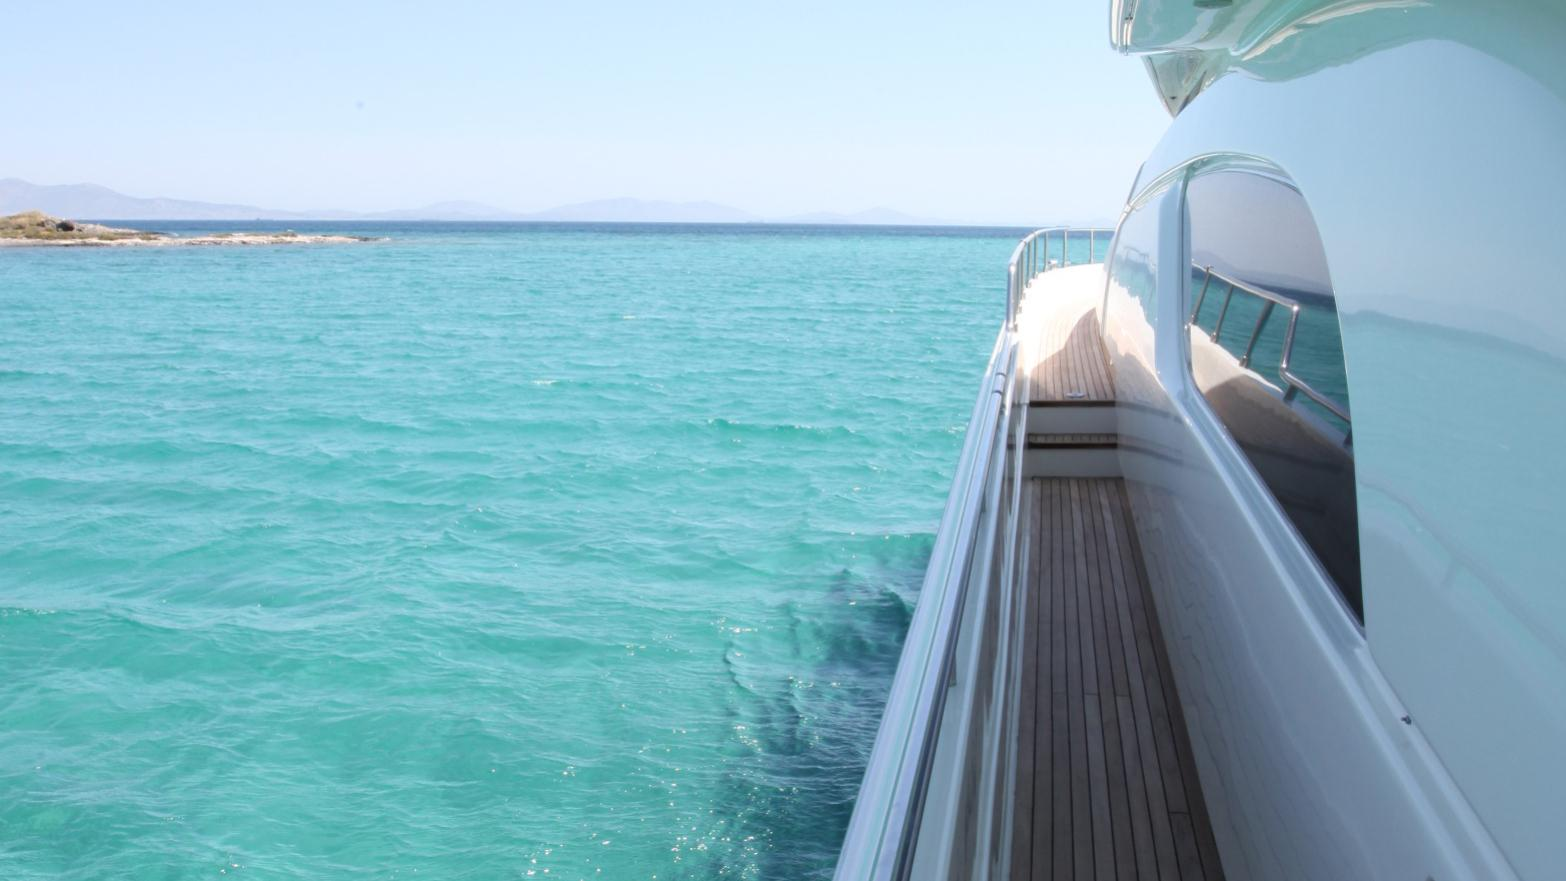 kentavros-ii-yacht-side-deck